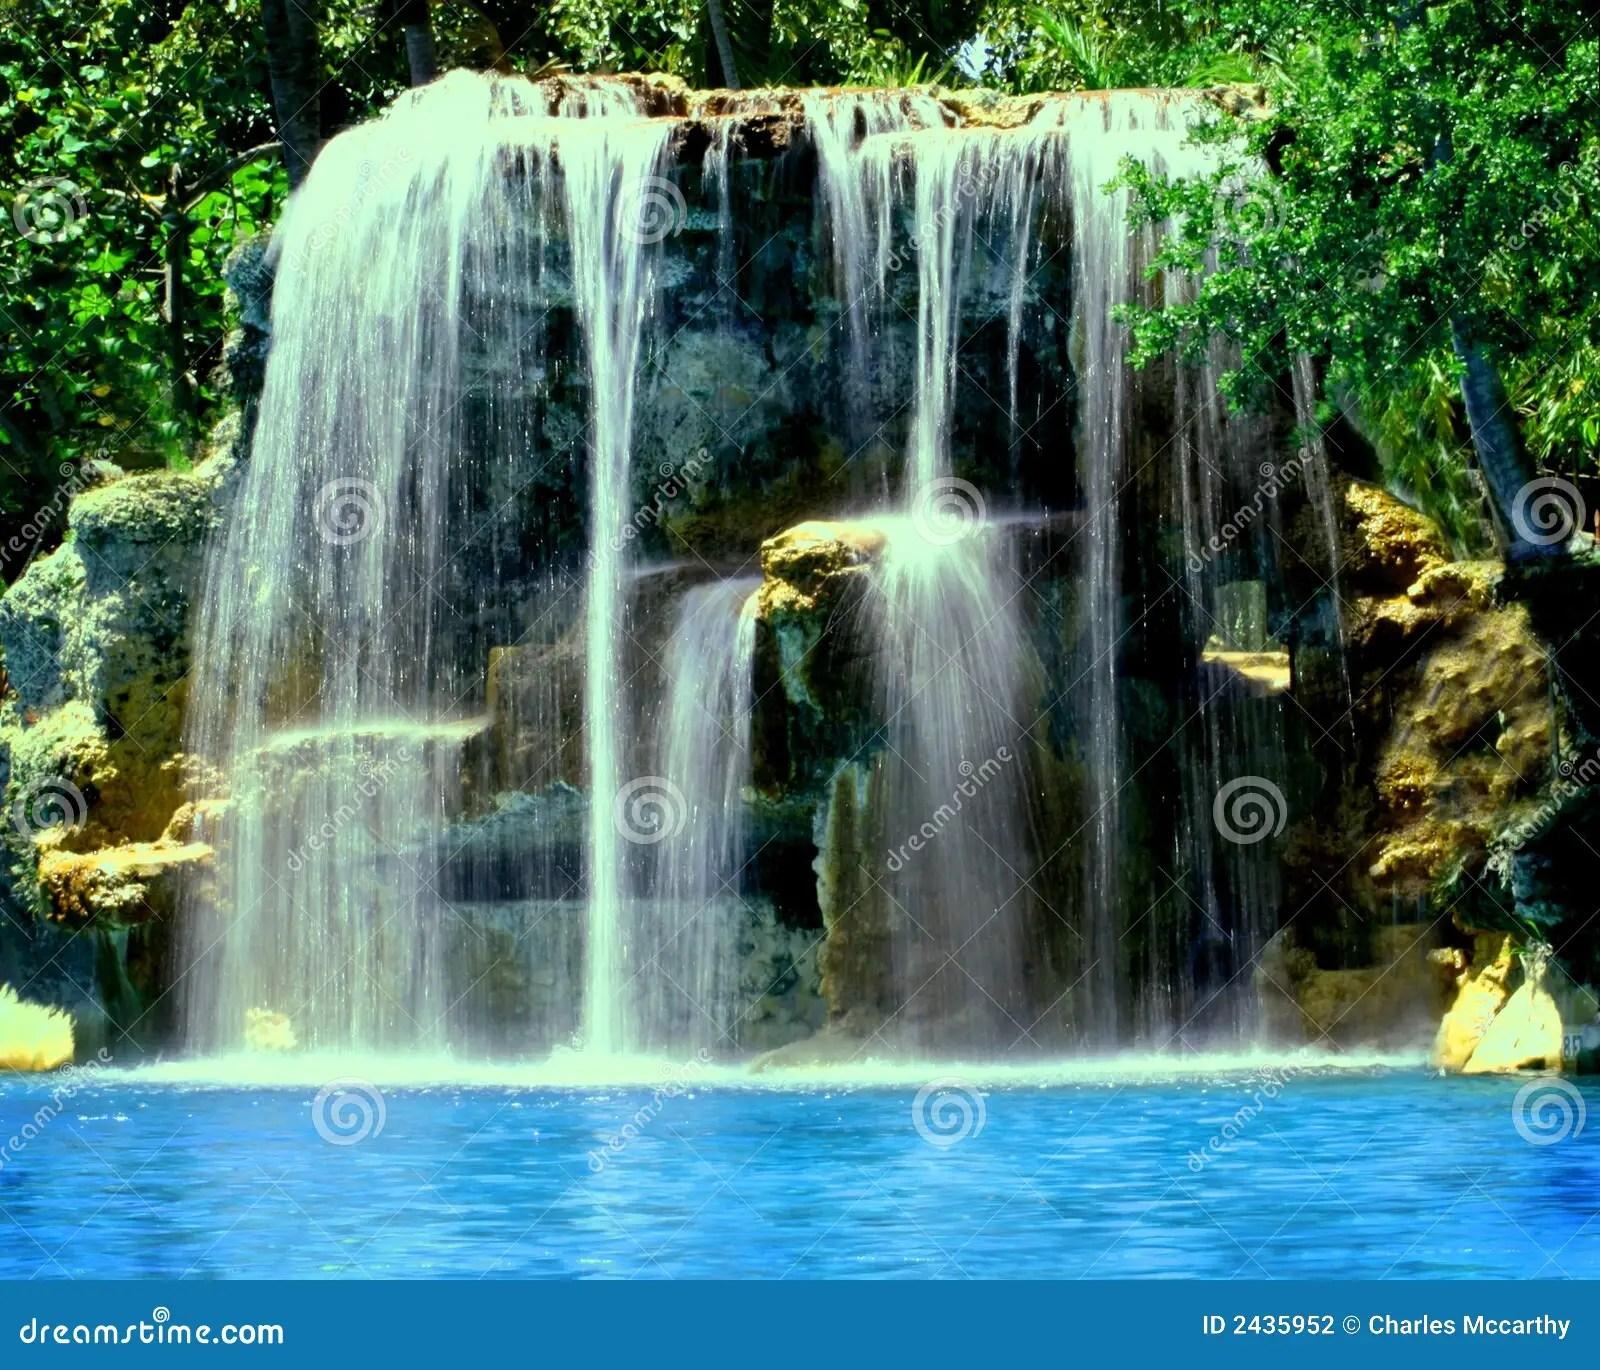 Wallpaper Of Water Fall Historic Florida Venetian Pool Stock Photo Image 2435952